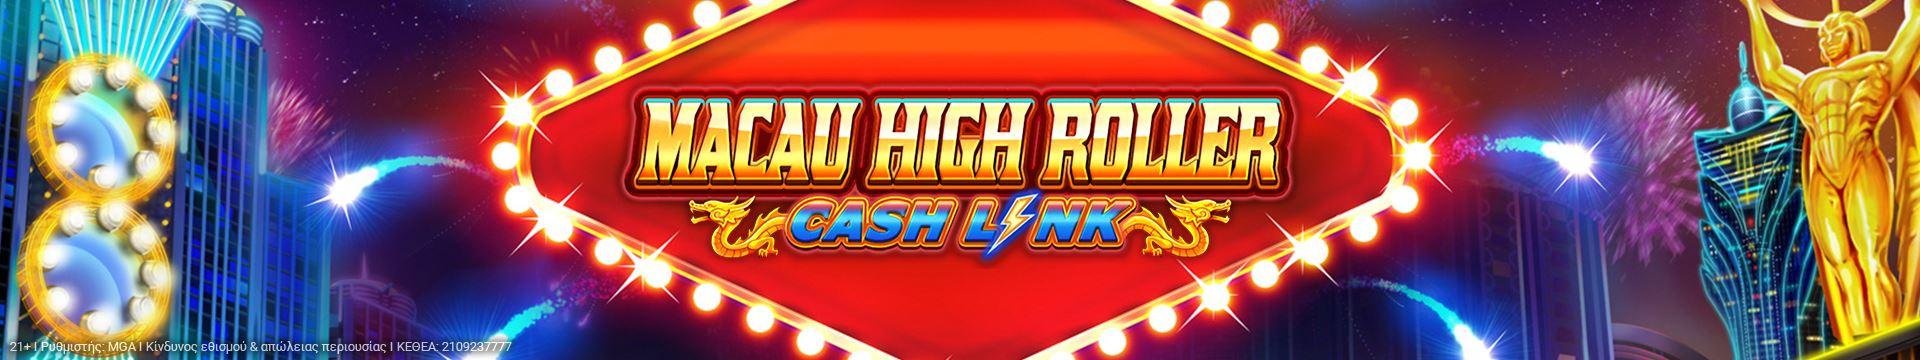 Macau_High_Roller